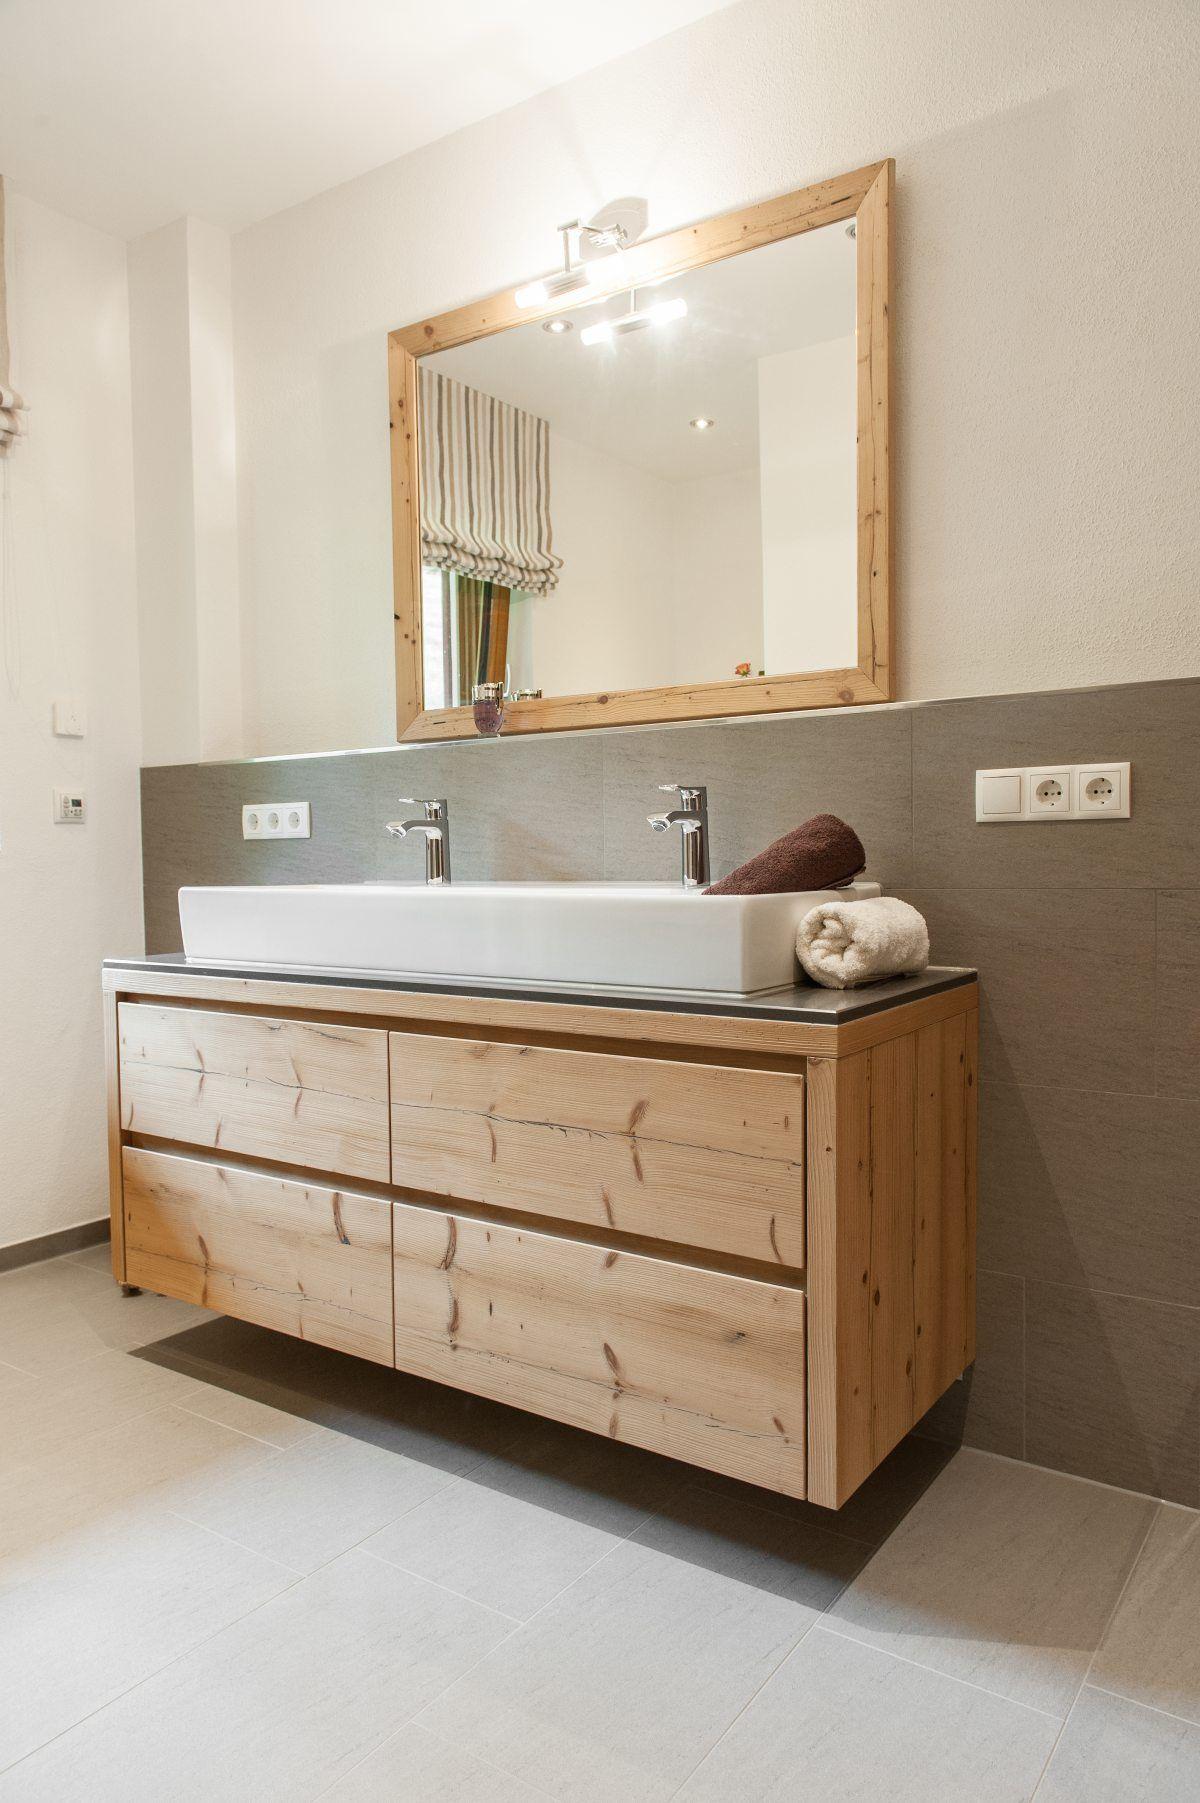 Badmobel In Fichte Altholz Bad Gunstig Renovieren Badezimmer Gunstig Badezimmer